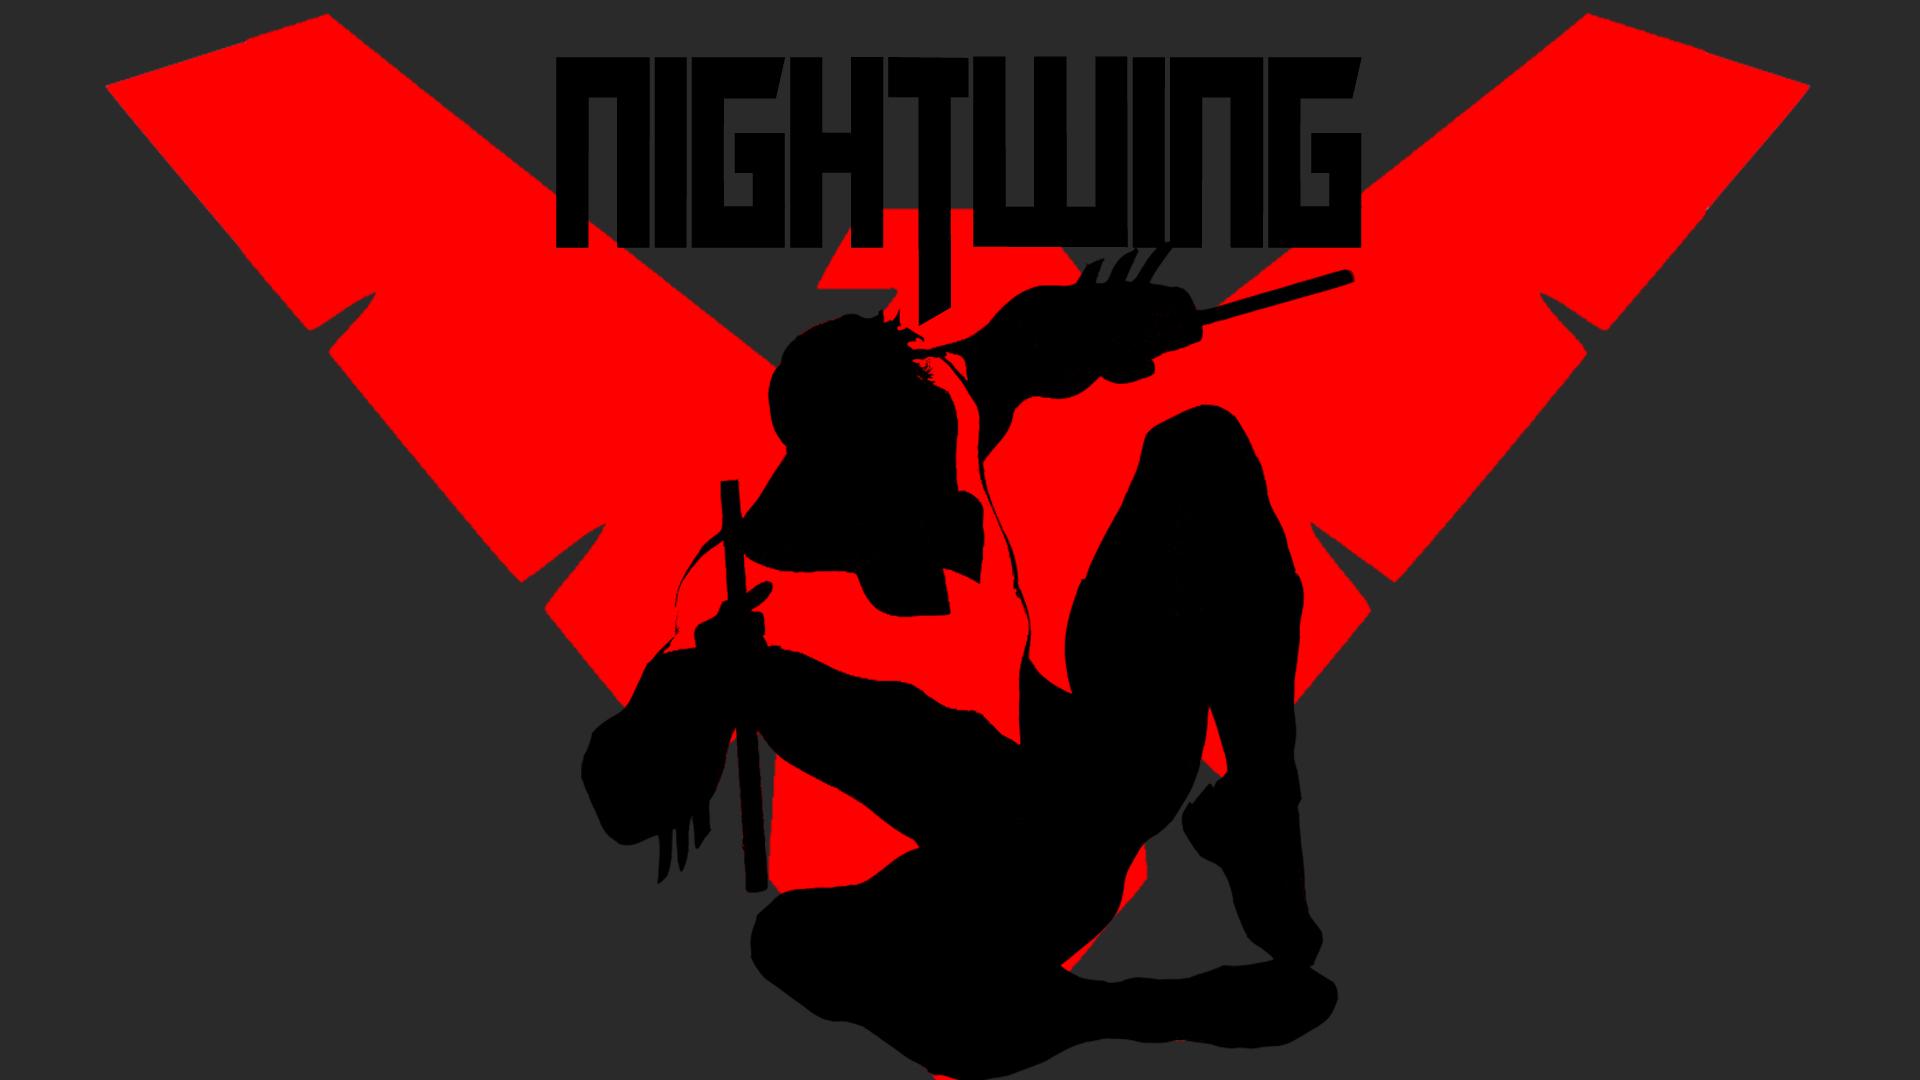 Nightwing Pop Art Wallpaper By Blades0100 On Deviantart